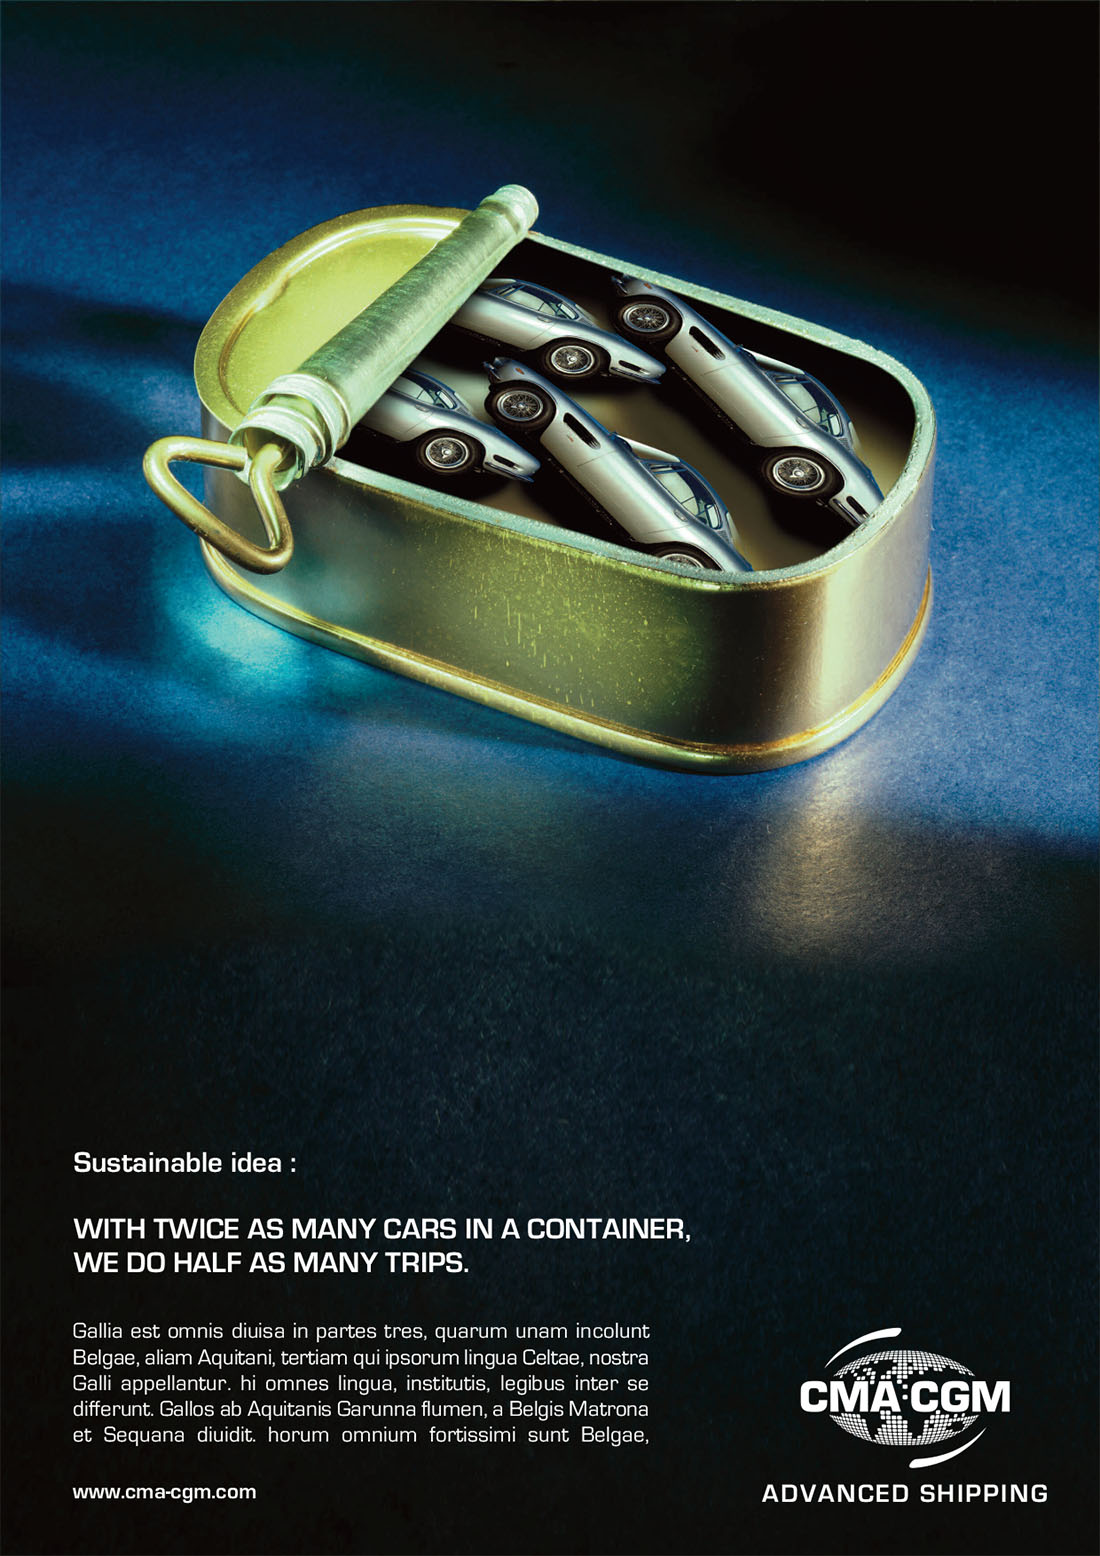 Capsule Cafe Royale Nespresso Promo